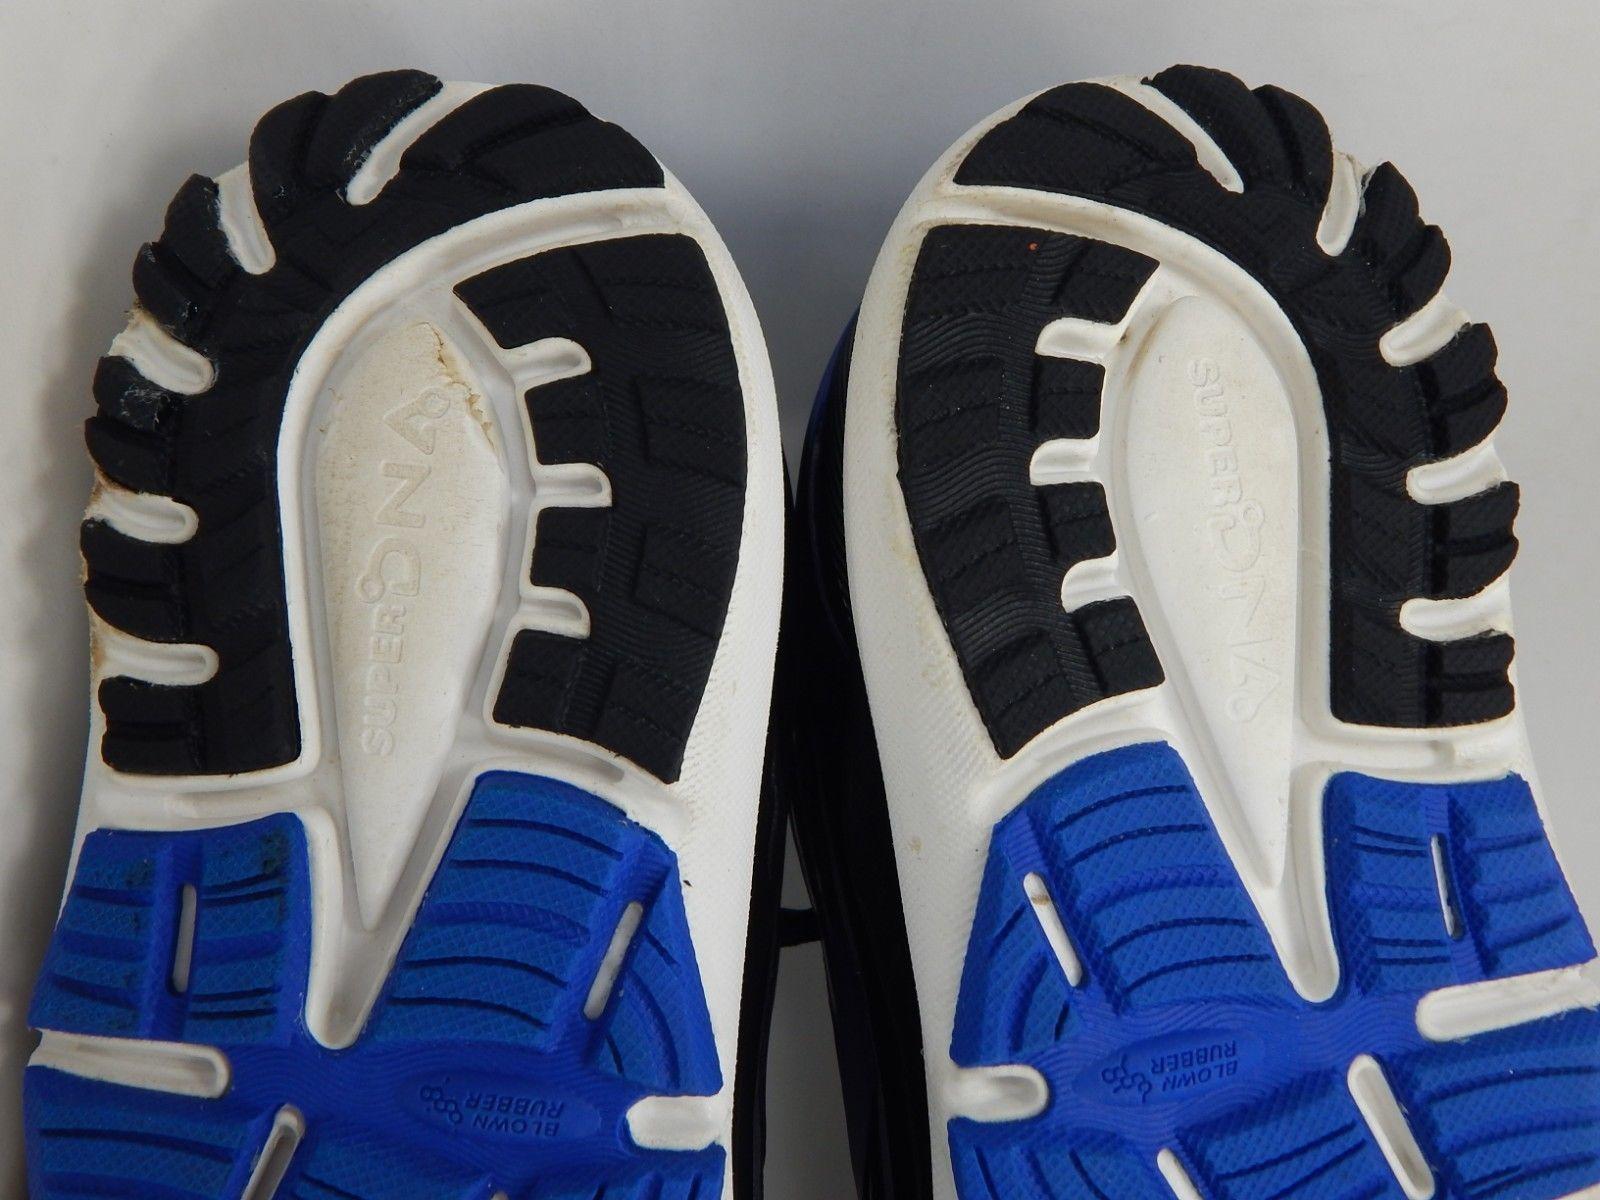 Brooks Transcend 4 Size US 10 M (D) EU 44 Men's Running Shoes Black 1102491D002 image 8